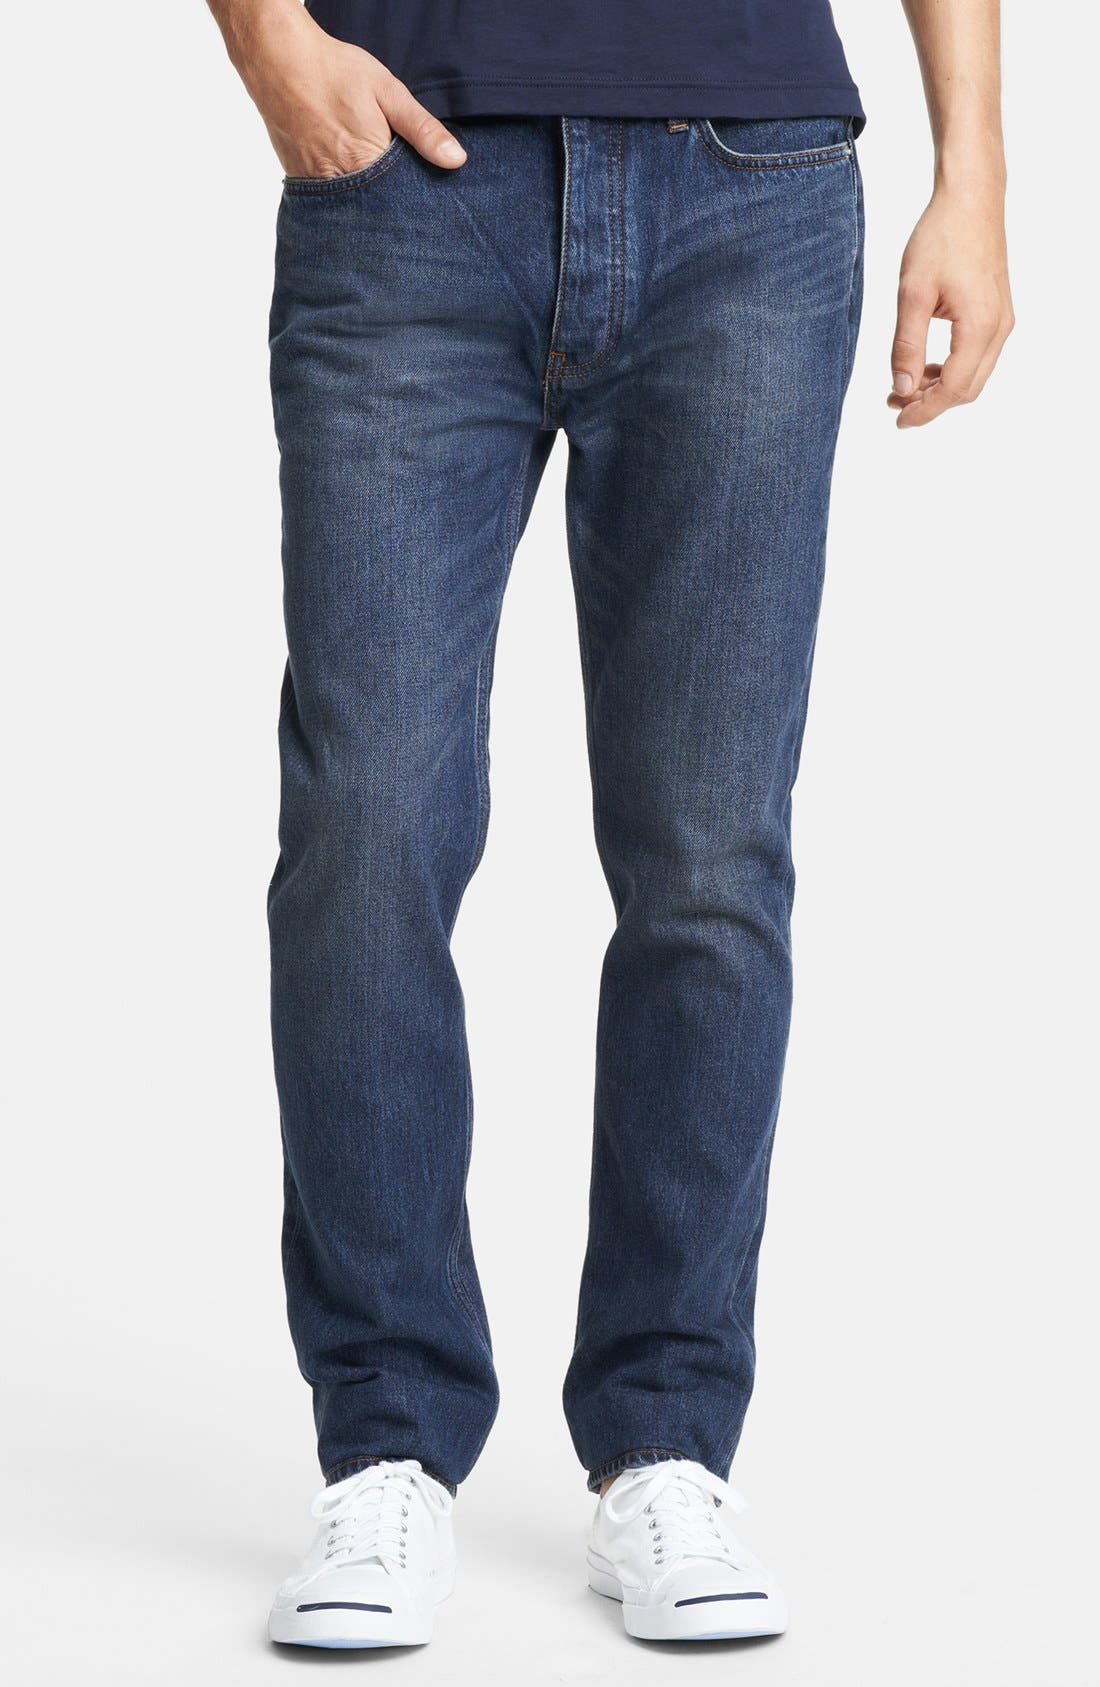 Alternate Image 1 Selected - BLK DNM 'Jeans 9' Straight Leg Jeans (Duane Blue)